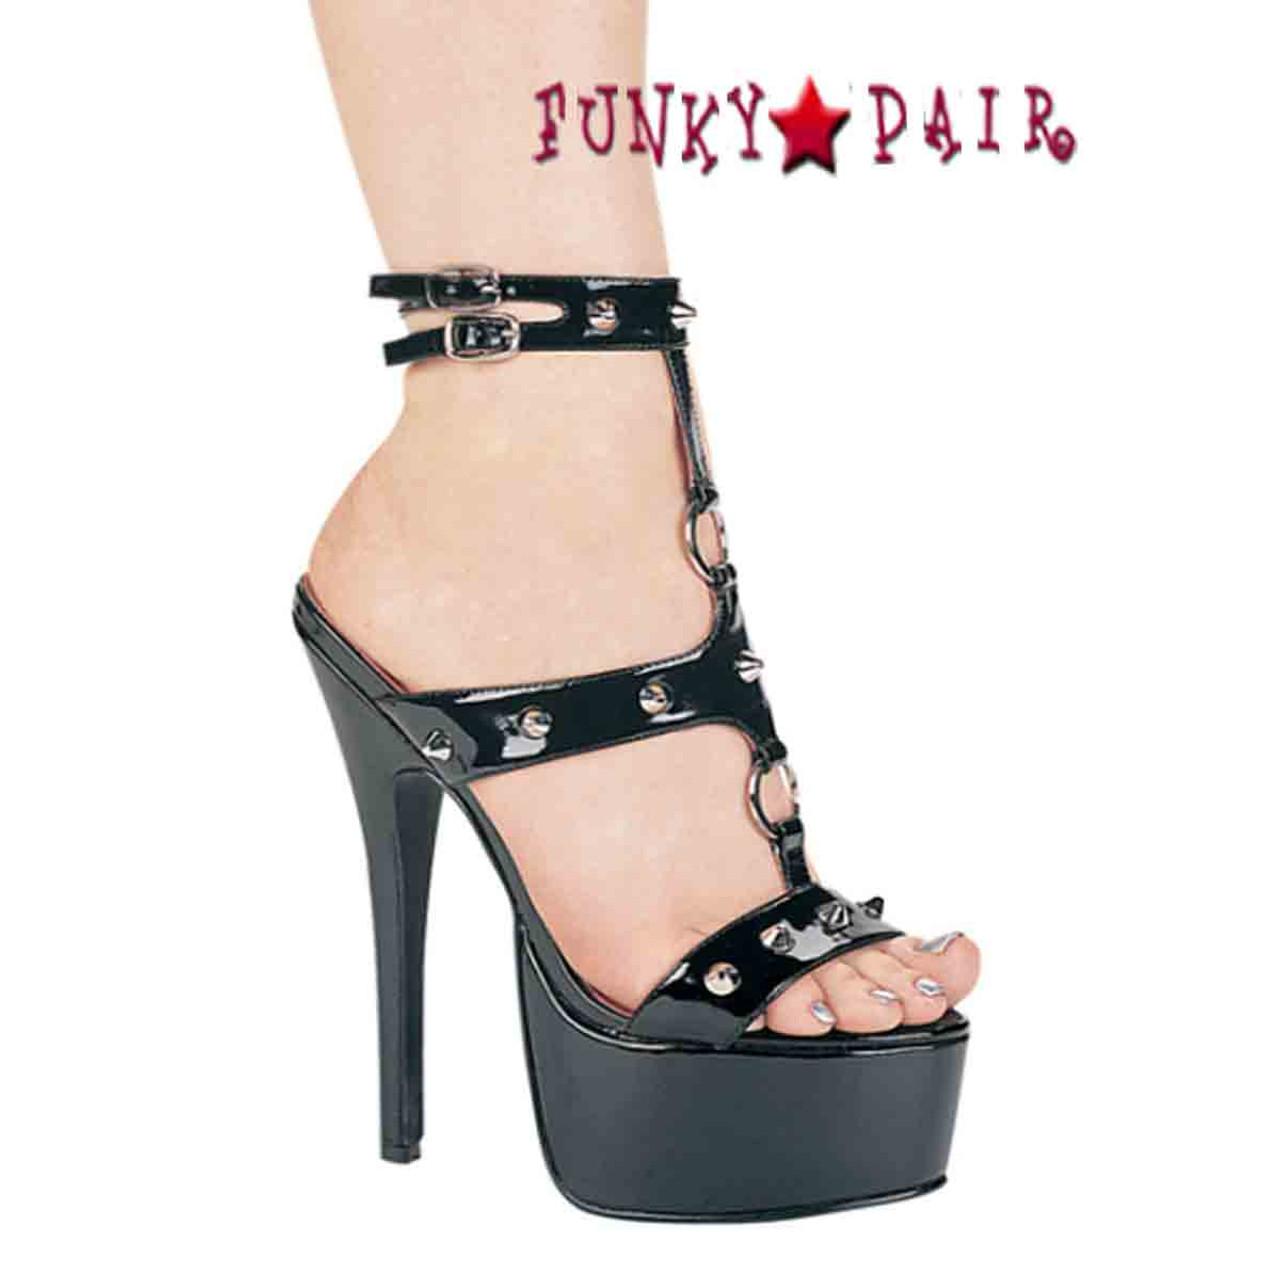 Stockings High Heels Tease